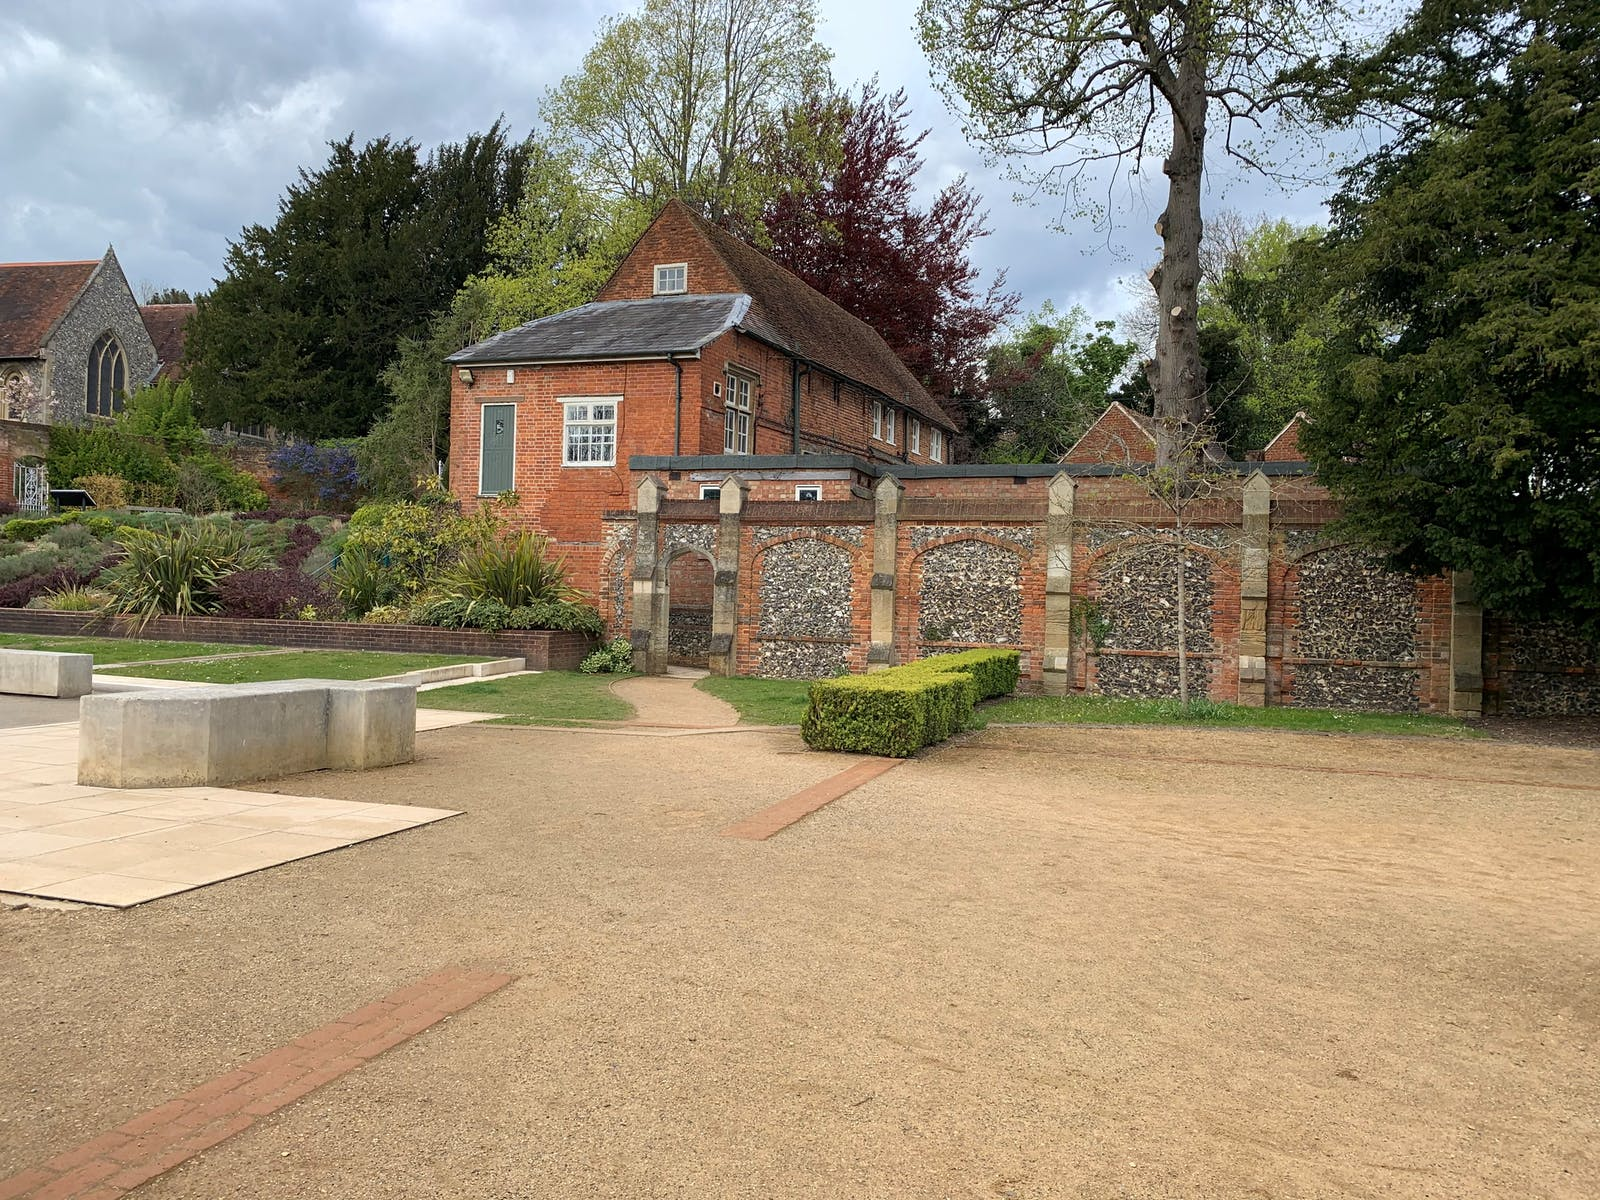 Caversham Court, Reading, Office / Residential / Education / Healthcare To Let / For Sale - Garden pic.jpg